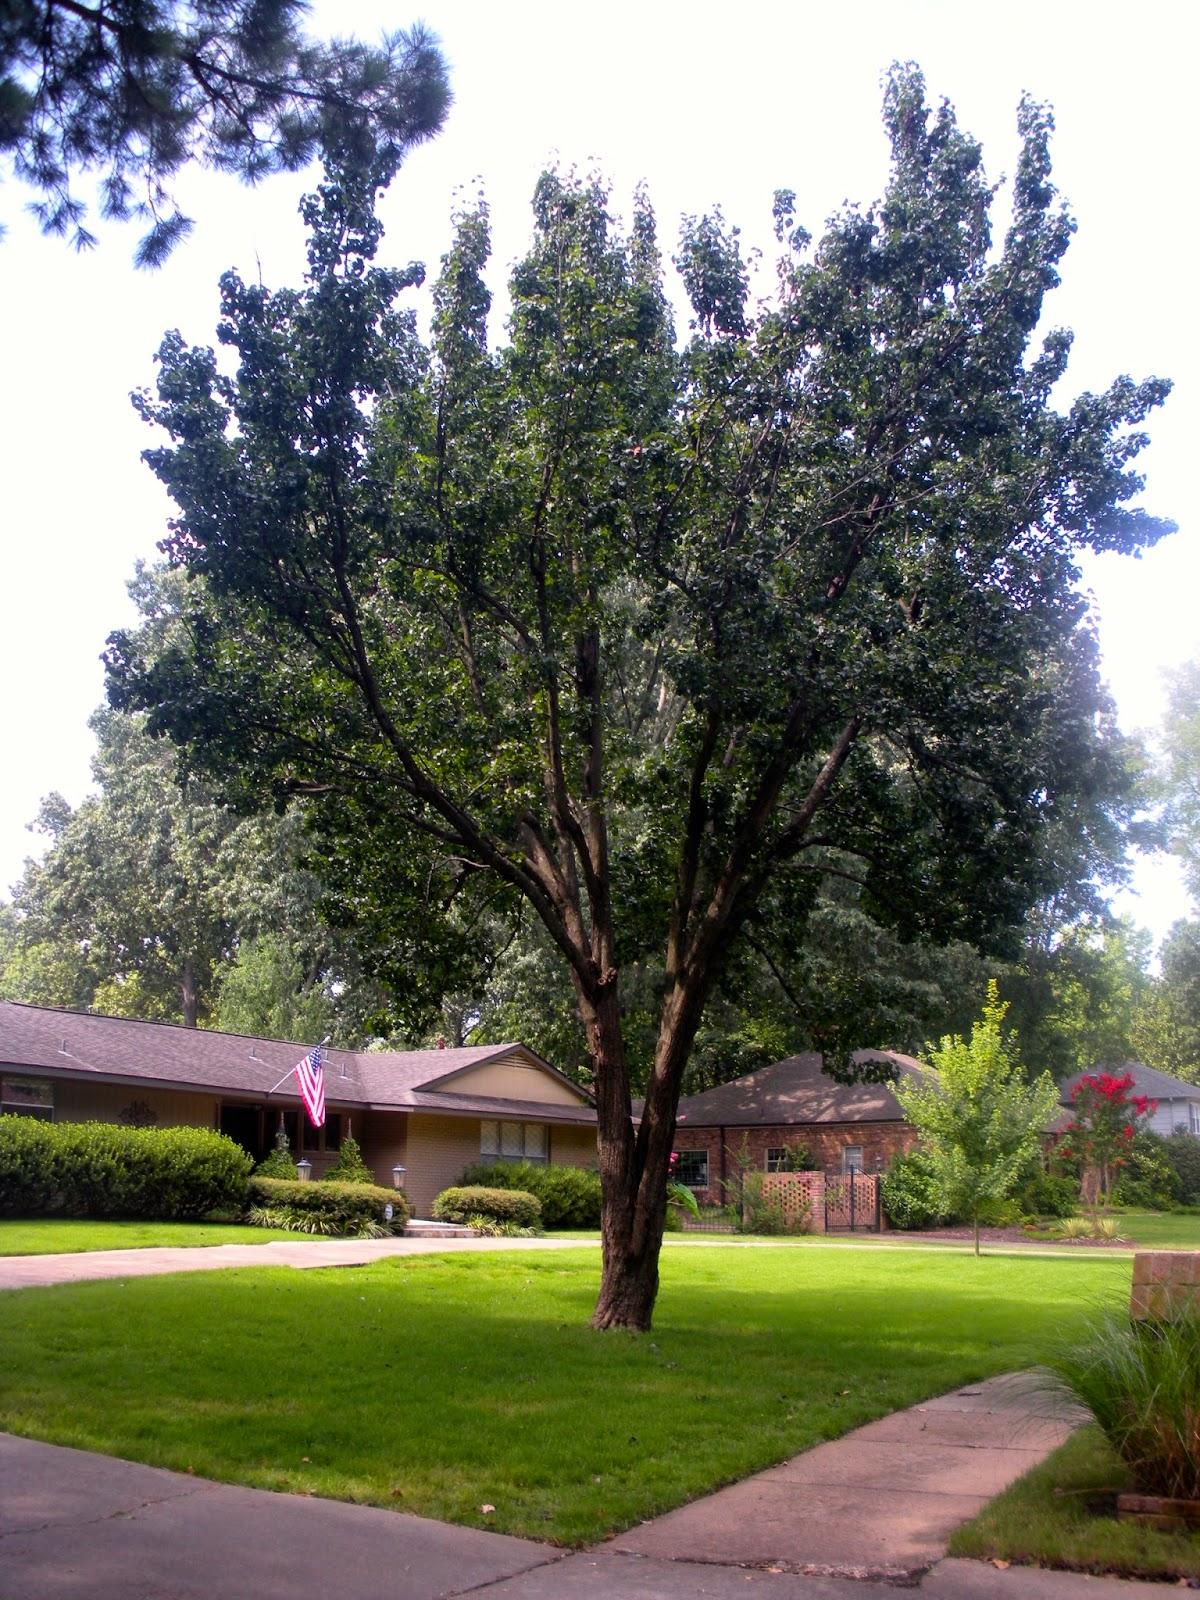 Memphis Trees August 2014: bradford pear